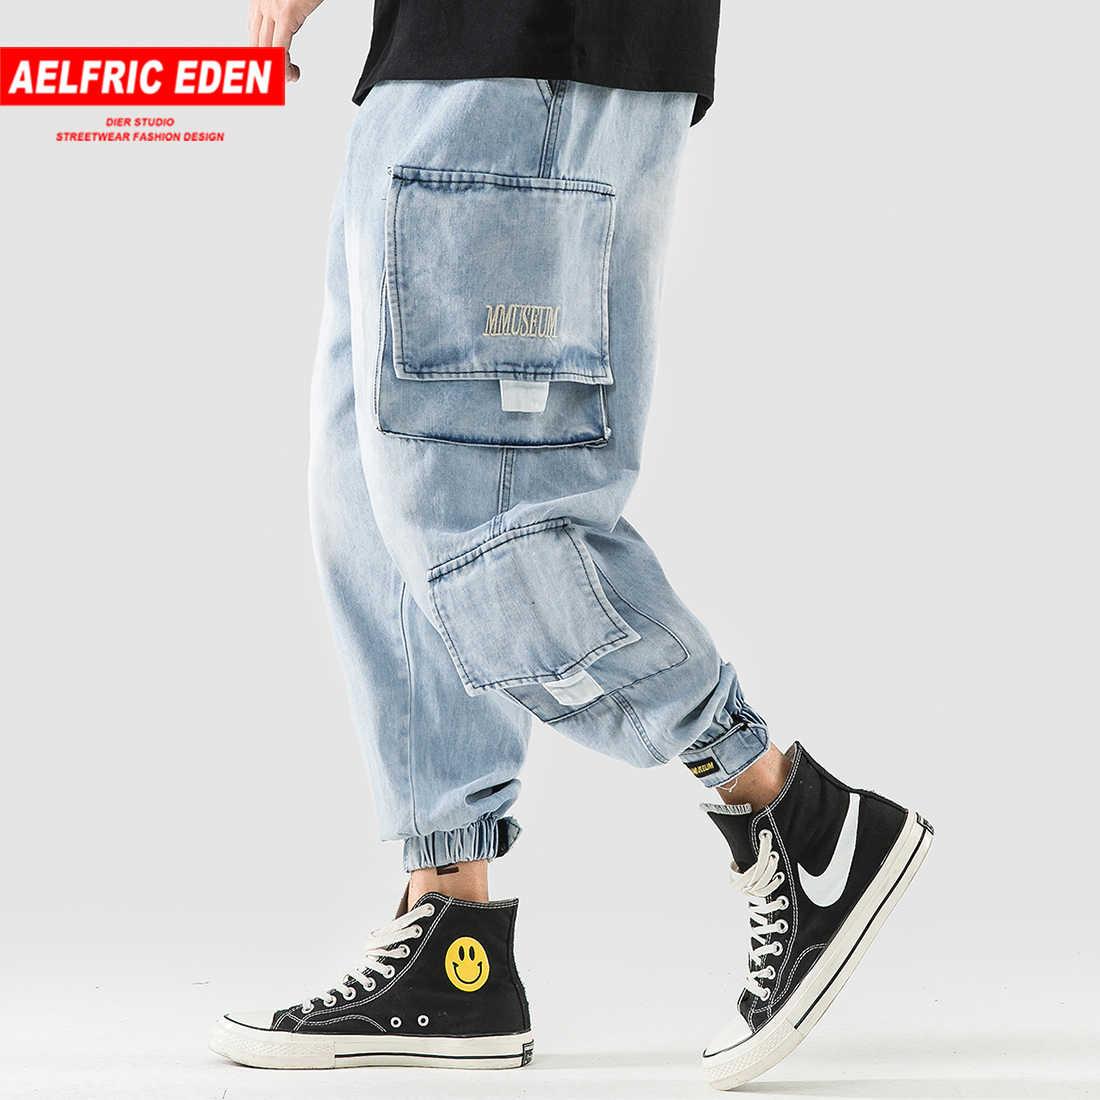 Aelfric Eden joggersy hip hopowe męskie 2018 nowy projekt